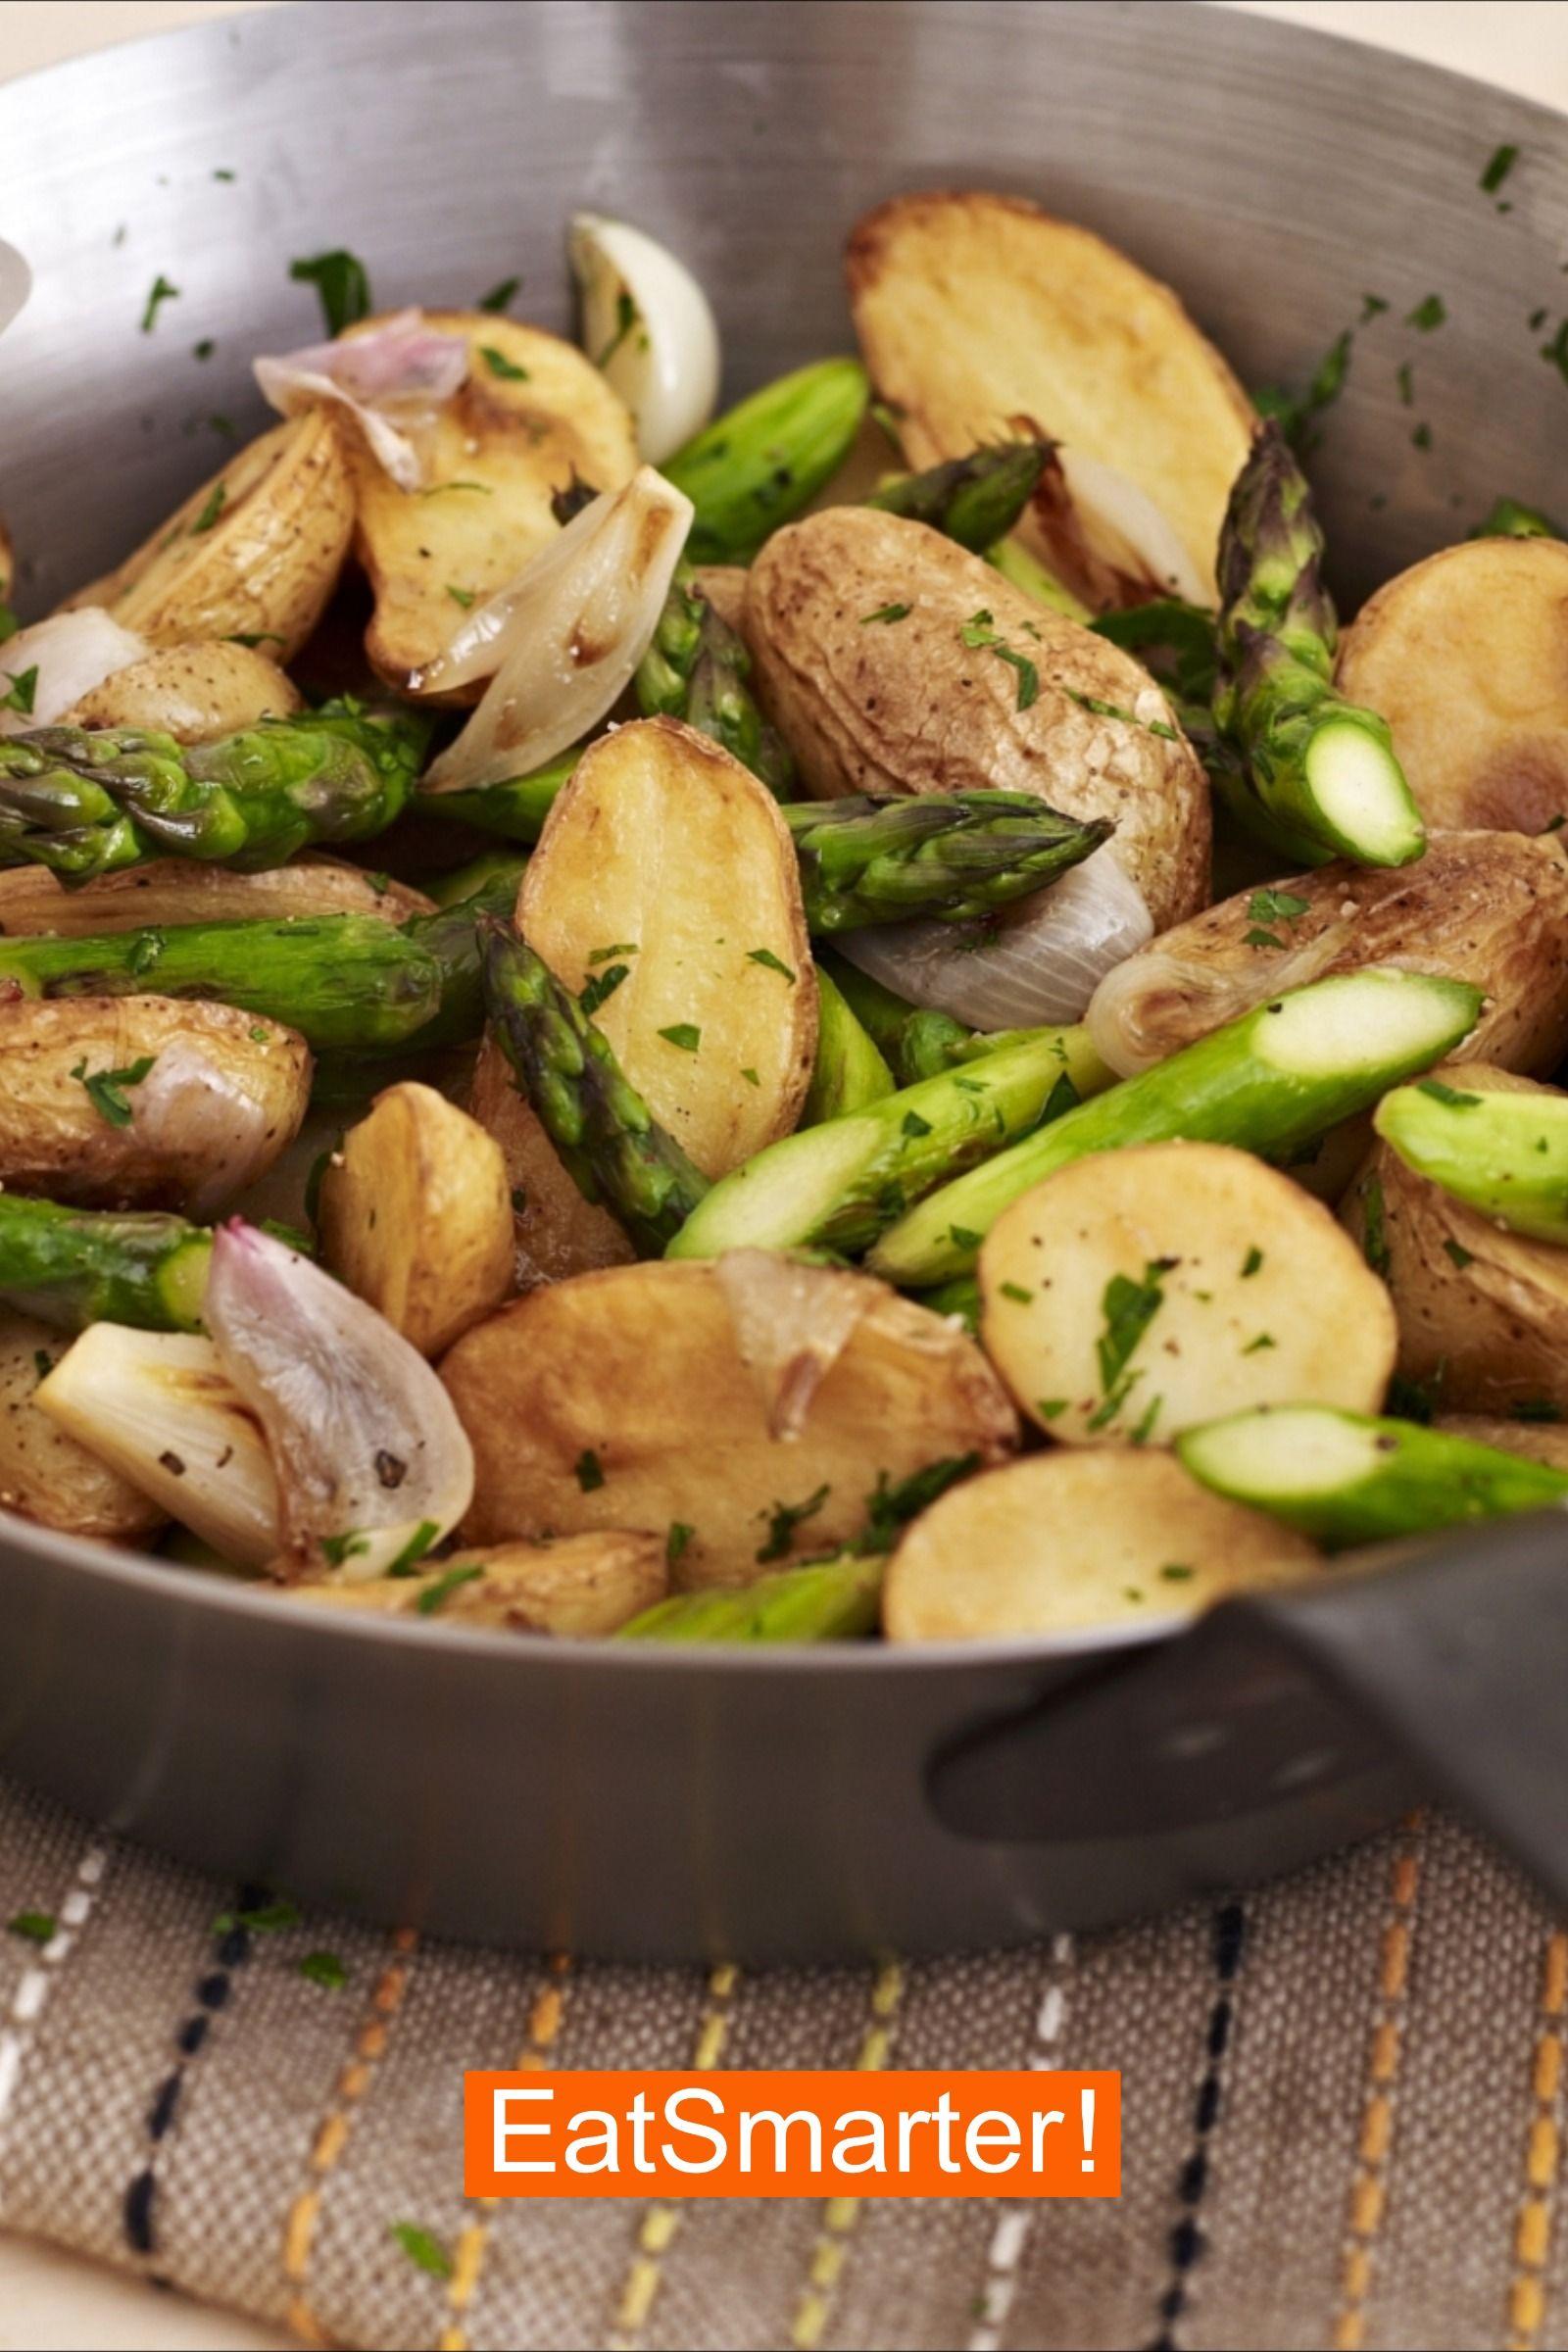 Spargel Rezepte: Bratkartoffel-Spargel-Pfanne | EAT SMARTER